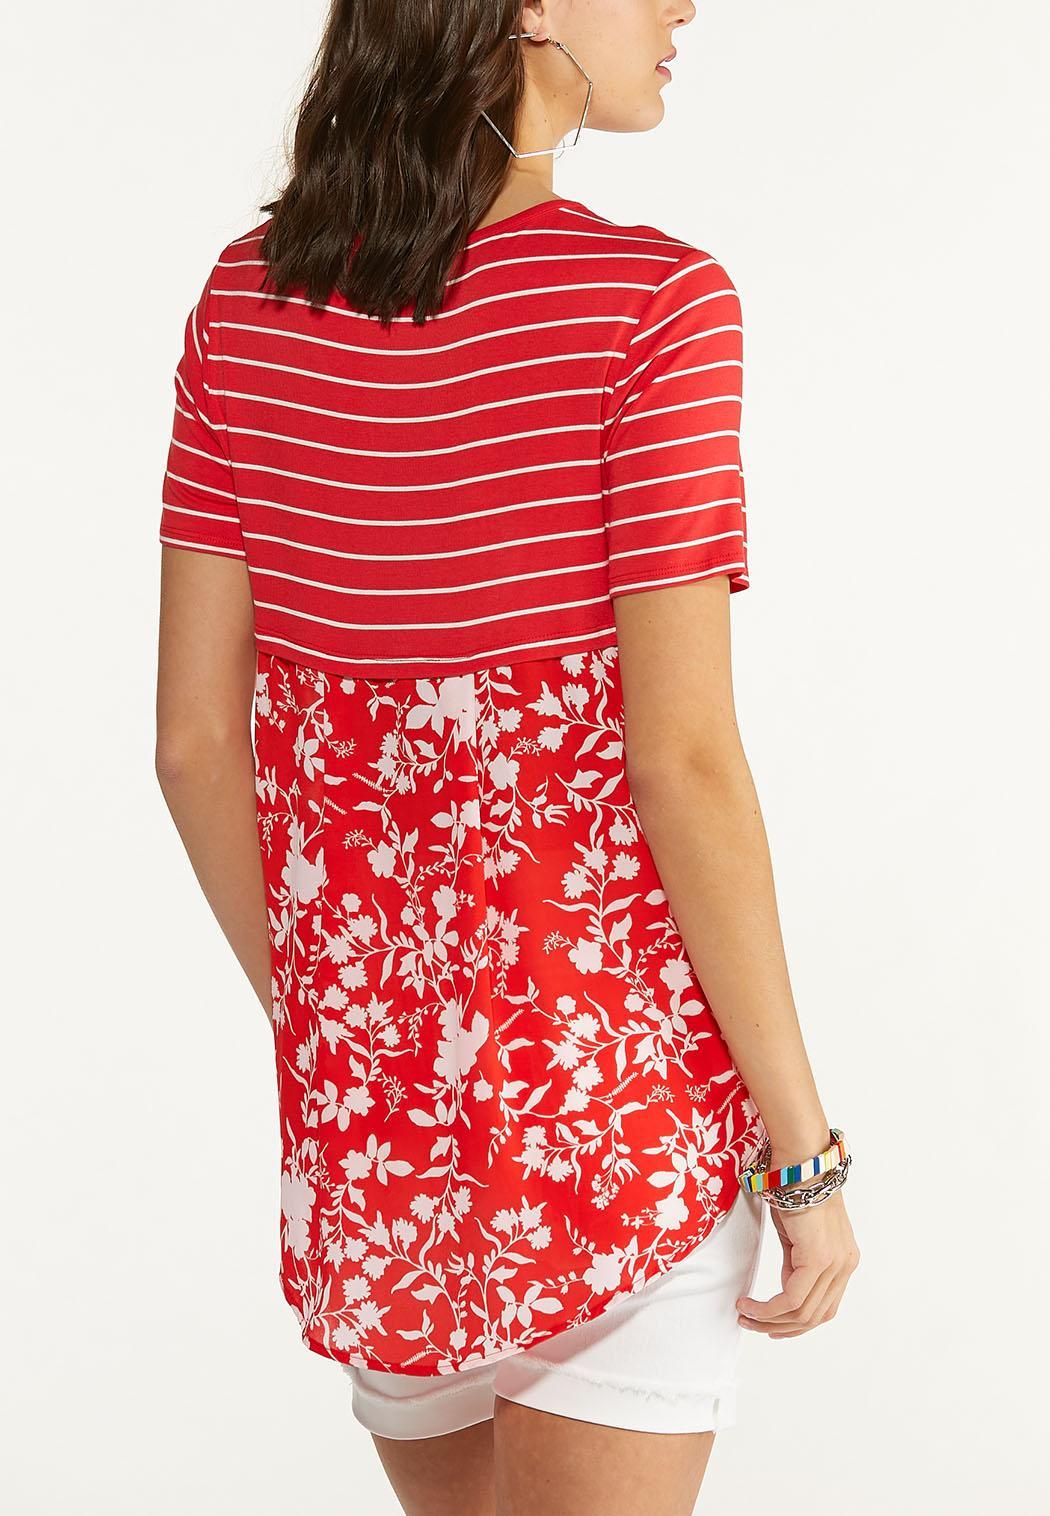 Plus Size Striped Floral Back Top (Item #44601671)